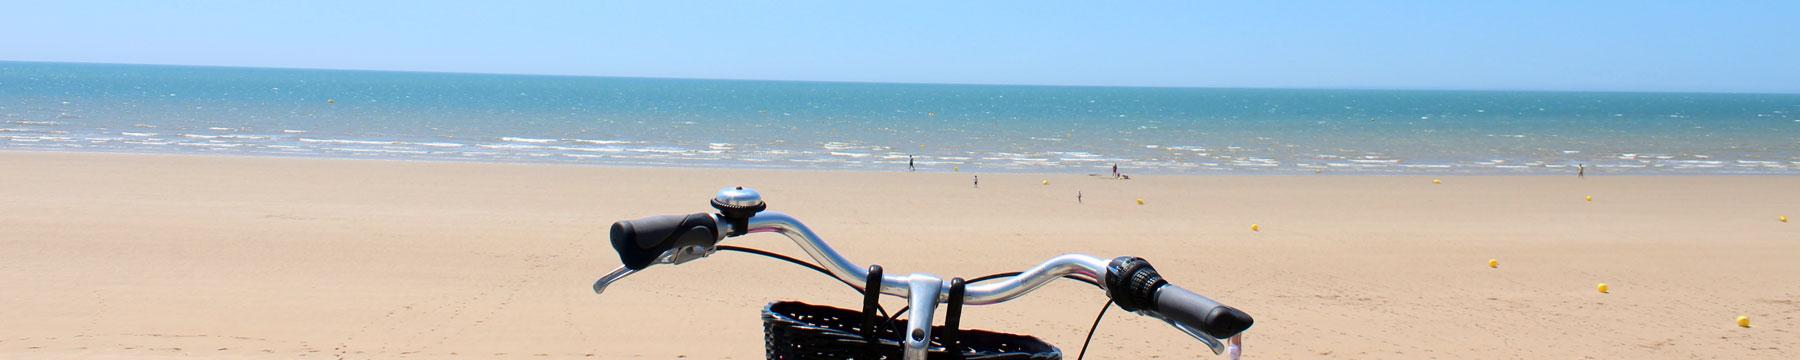 Fahrradverleih in Frankreich - FranceBikeHire.com